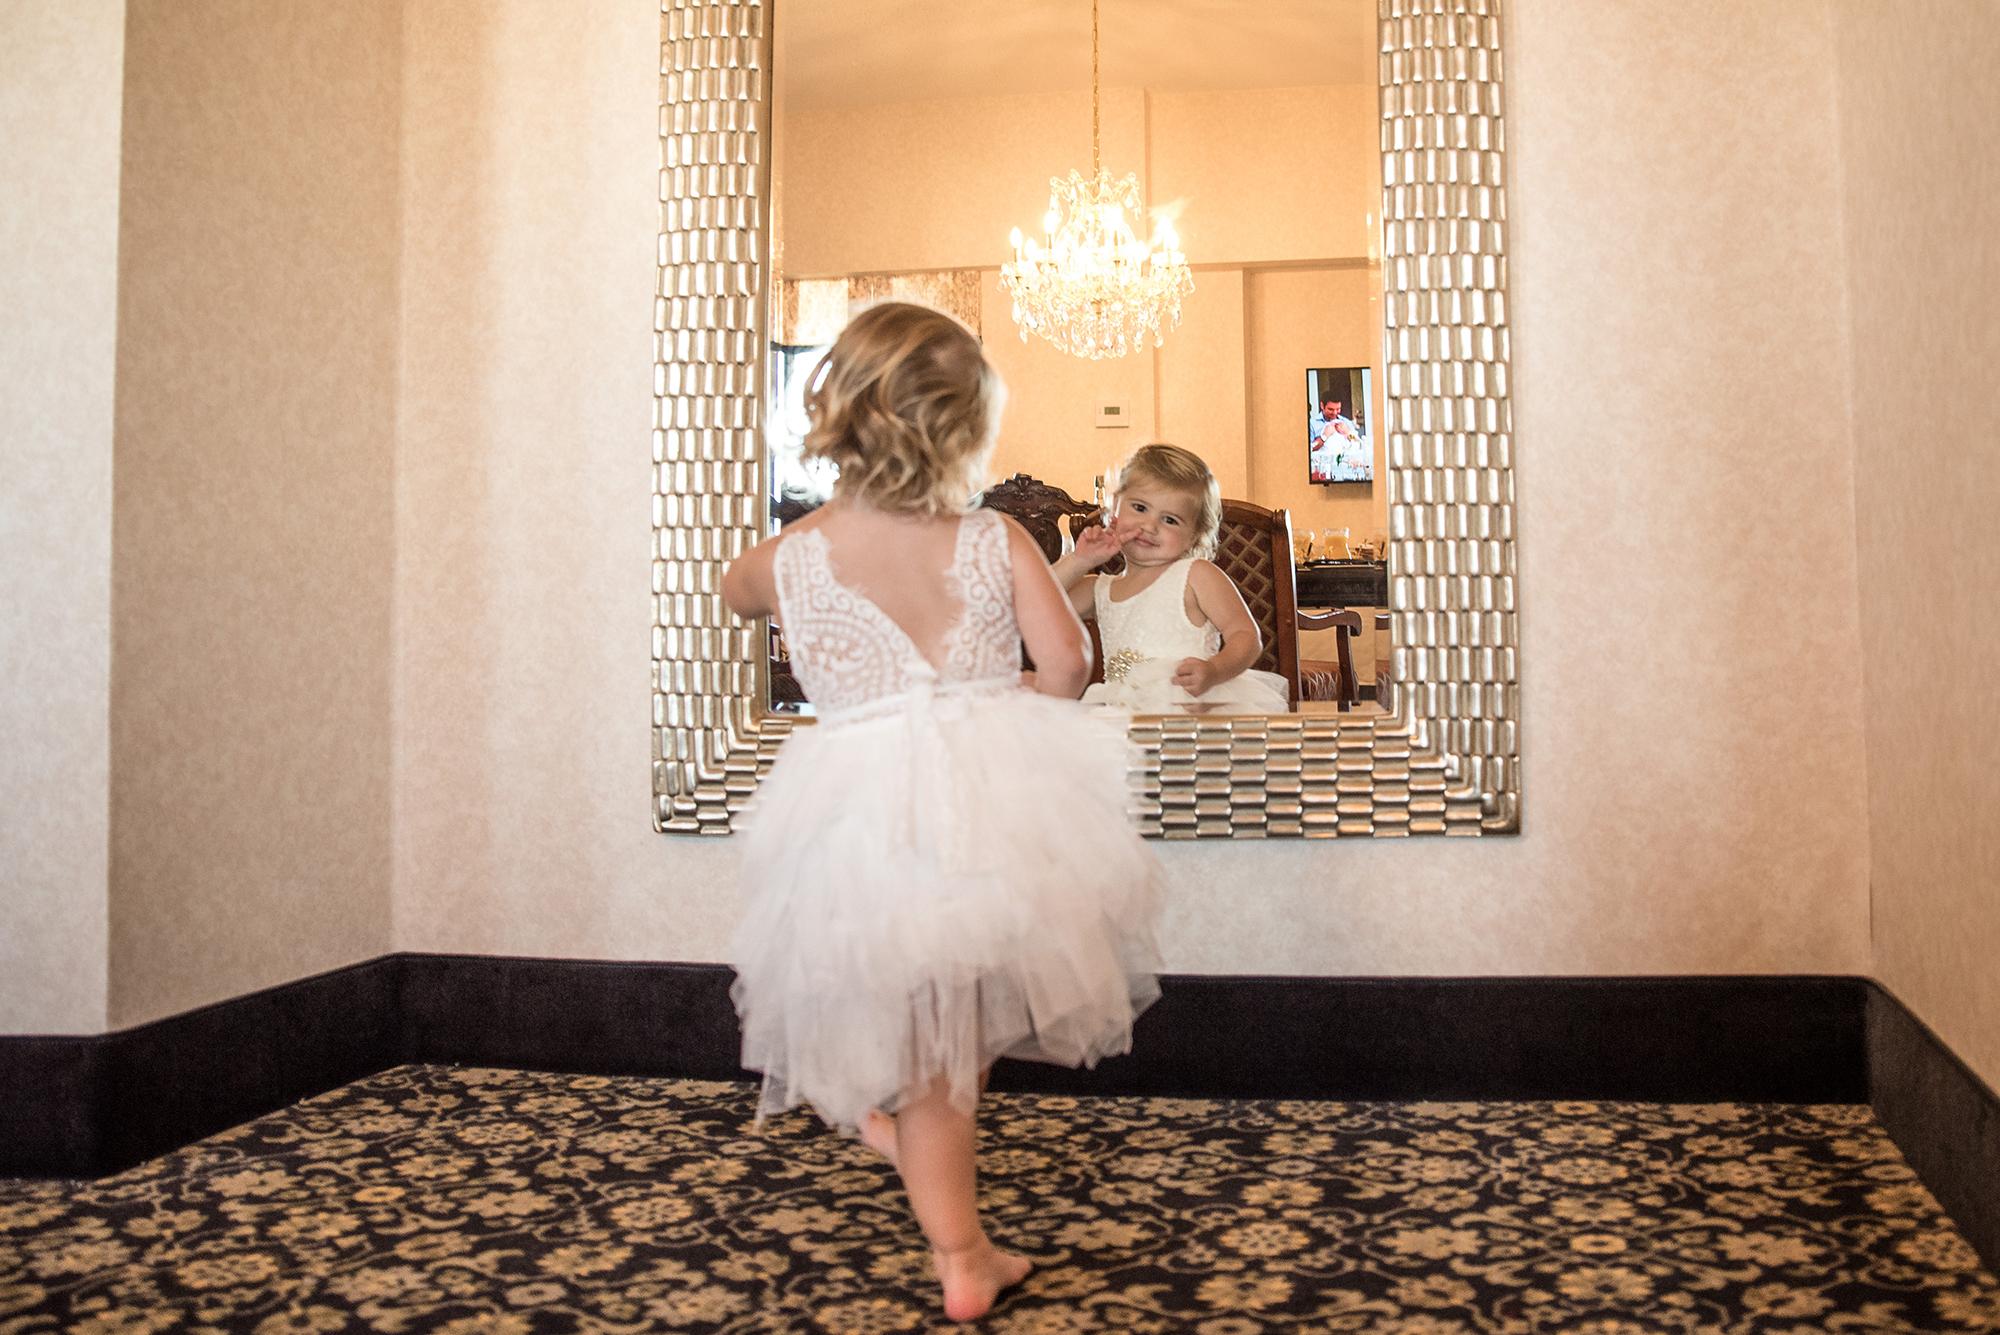 lbi-photographer-ac-wedding-claridge-val-11.jpg